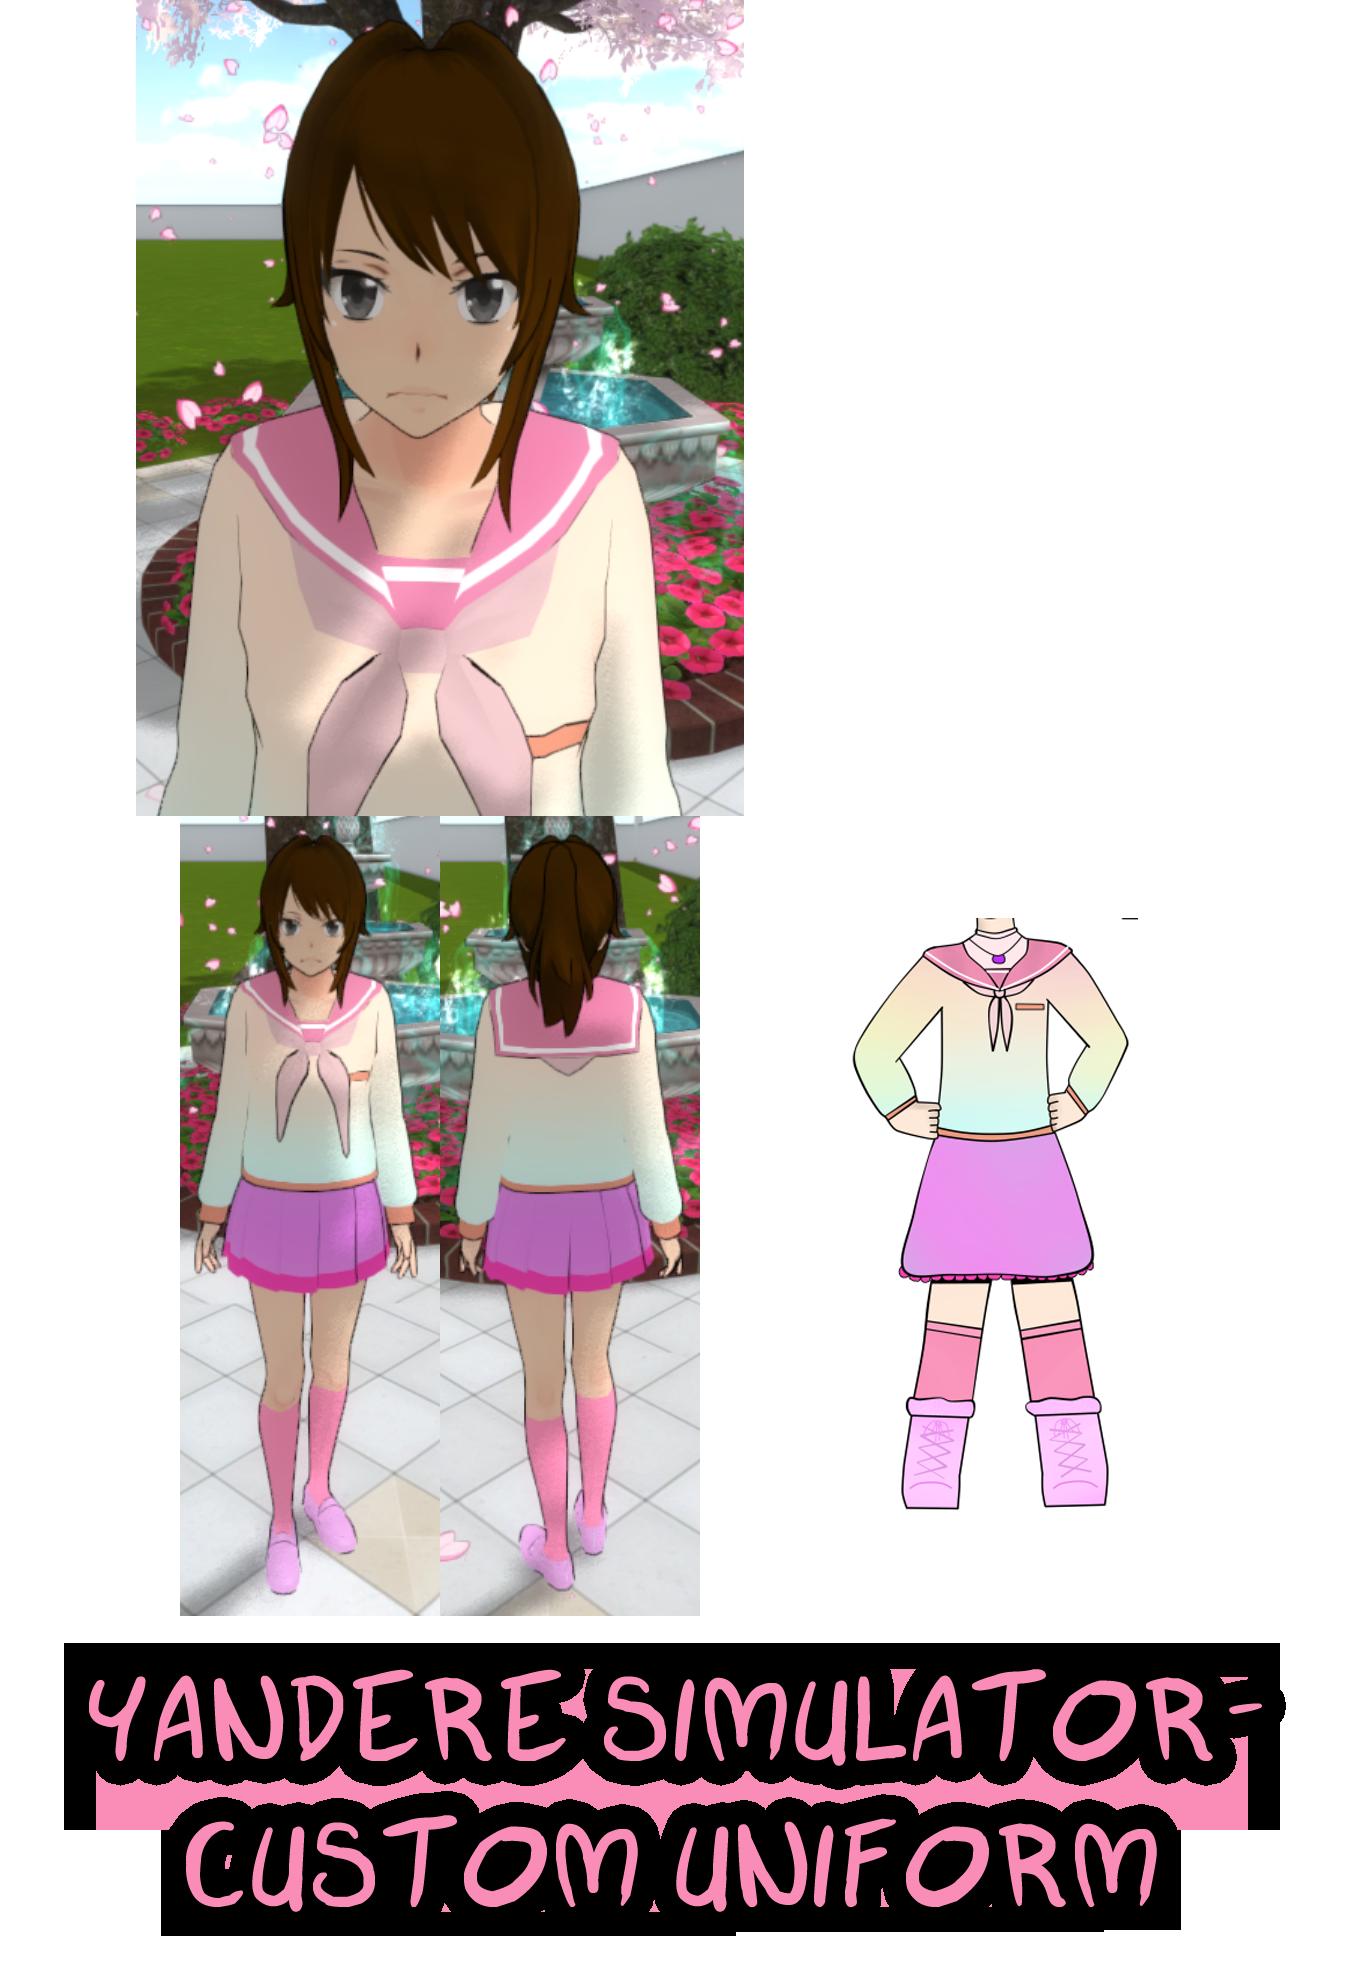 Yandere Simulator- Custom Uniform and Hair by ImaginaryAlchemist on